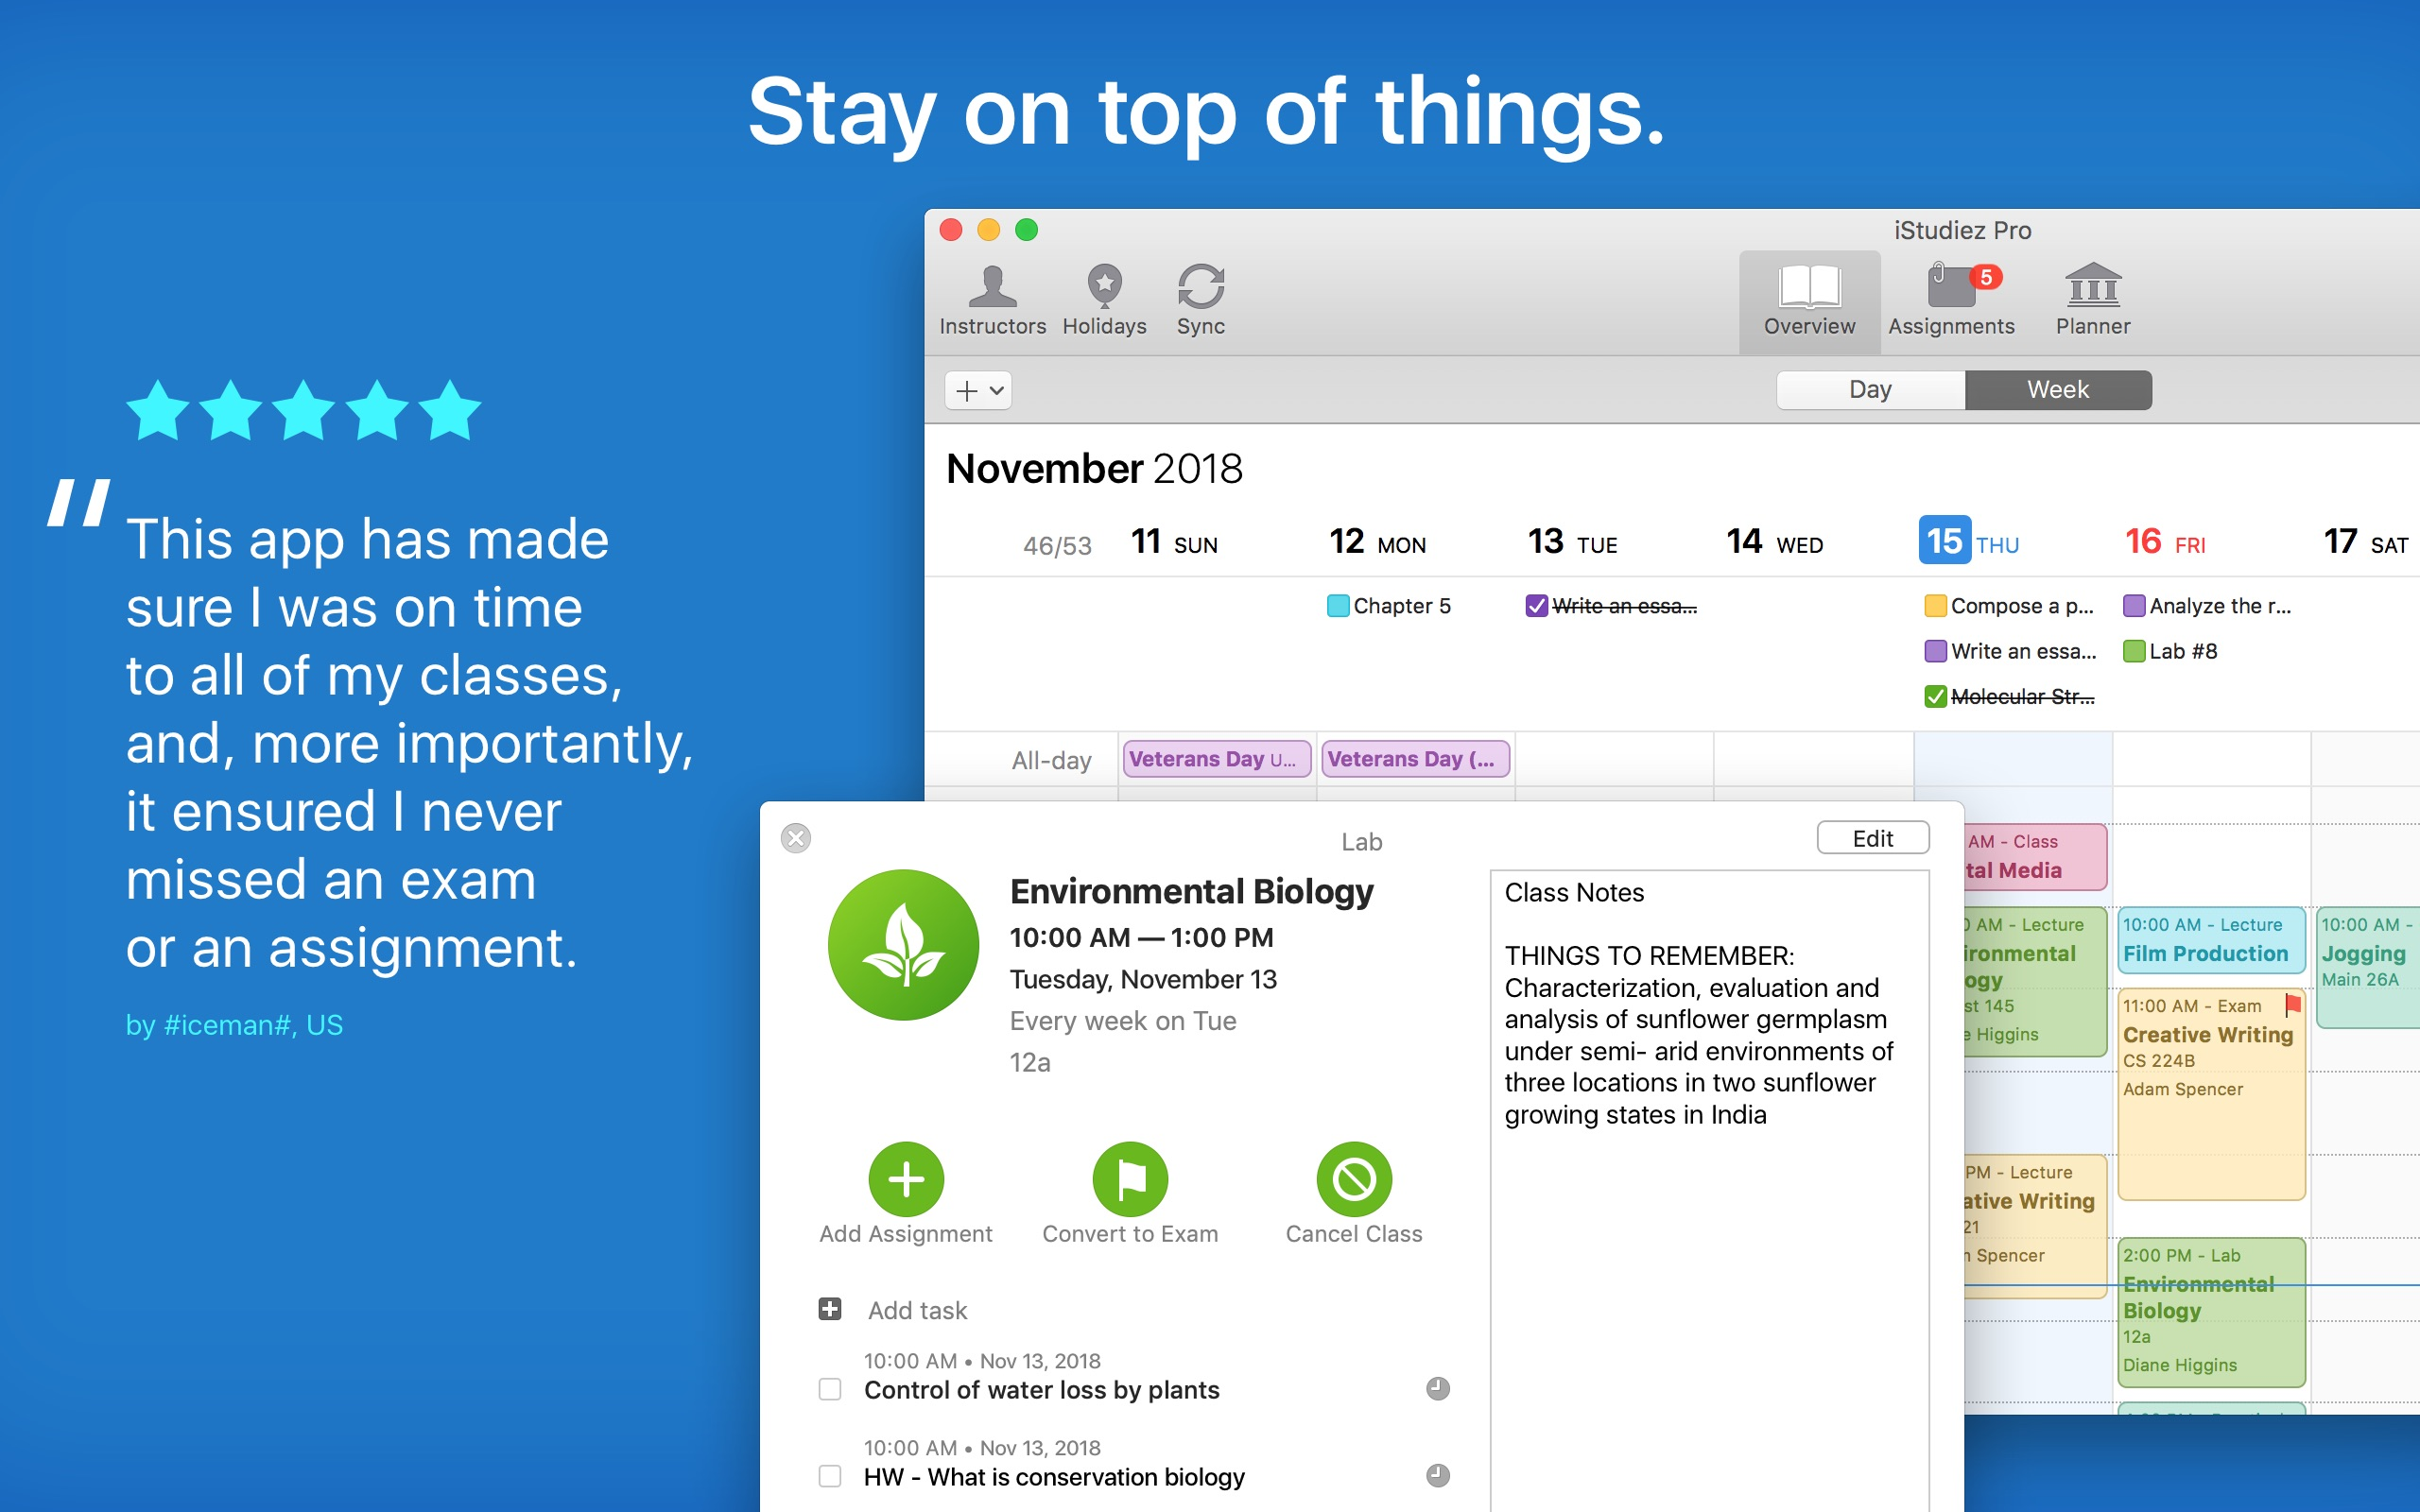 Screenshot do app iStudiez Pro Legendary Planner